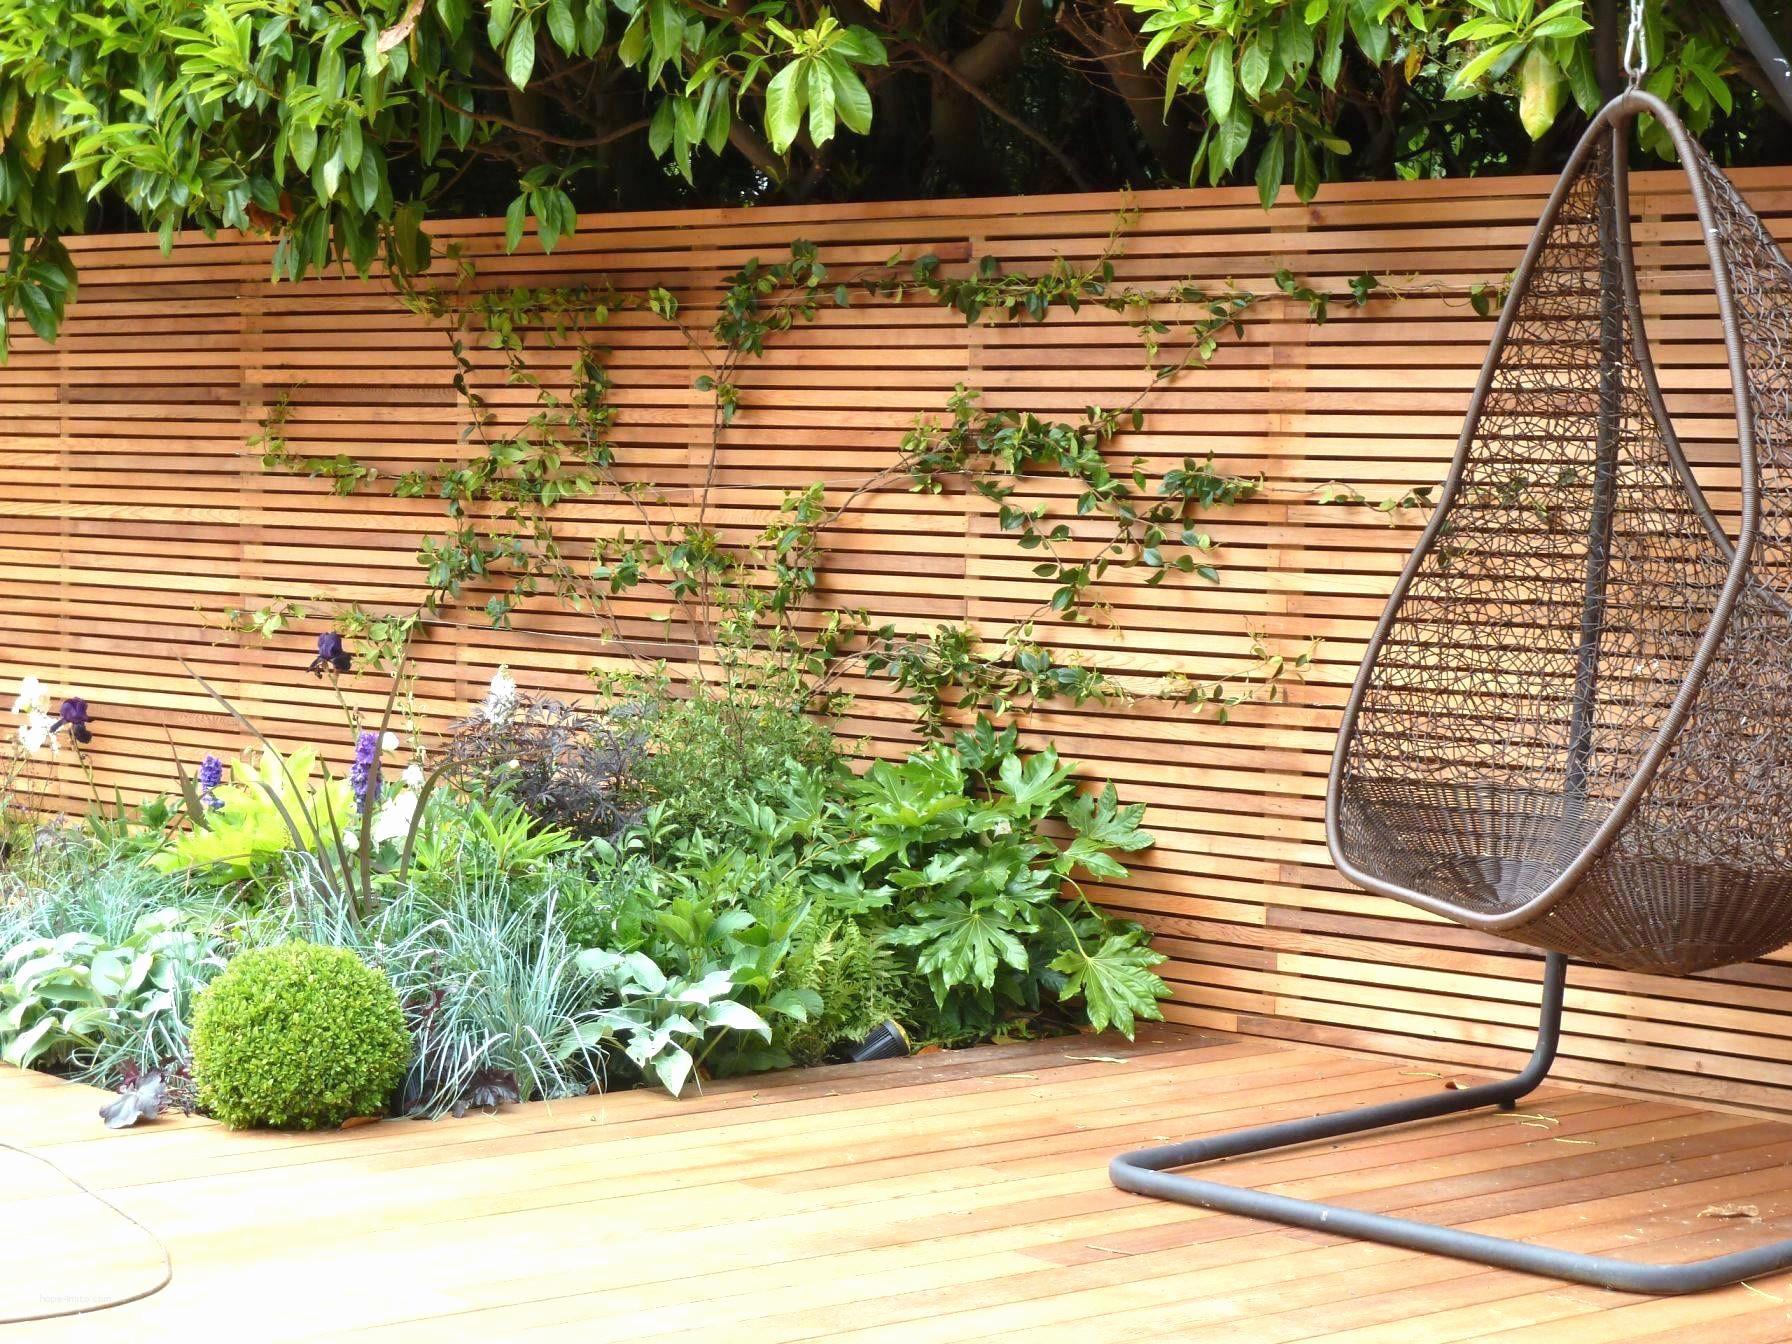 33 Neu Gartengestaltung Selber Machen Bilder Garten Deko